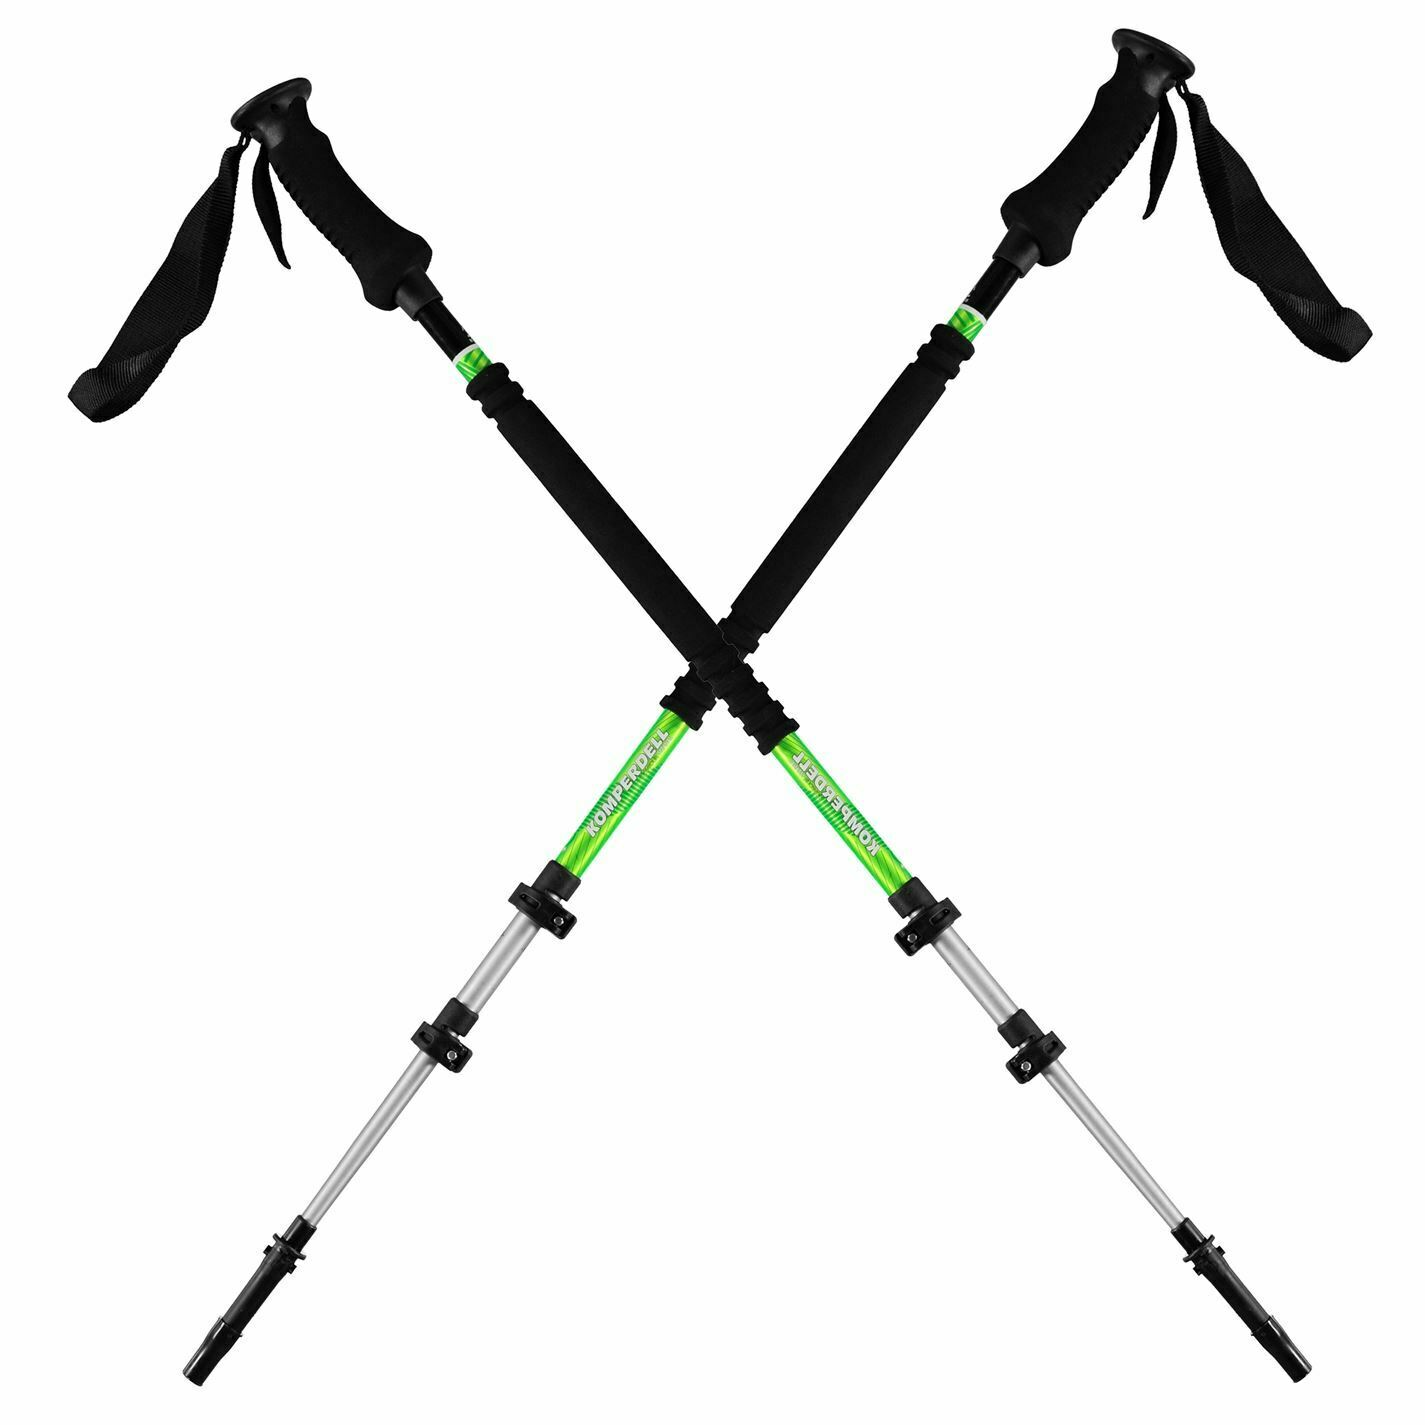 Komperdell T3 Aluminium Touring Poles Adults Unisex Ski Pole Lightweight